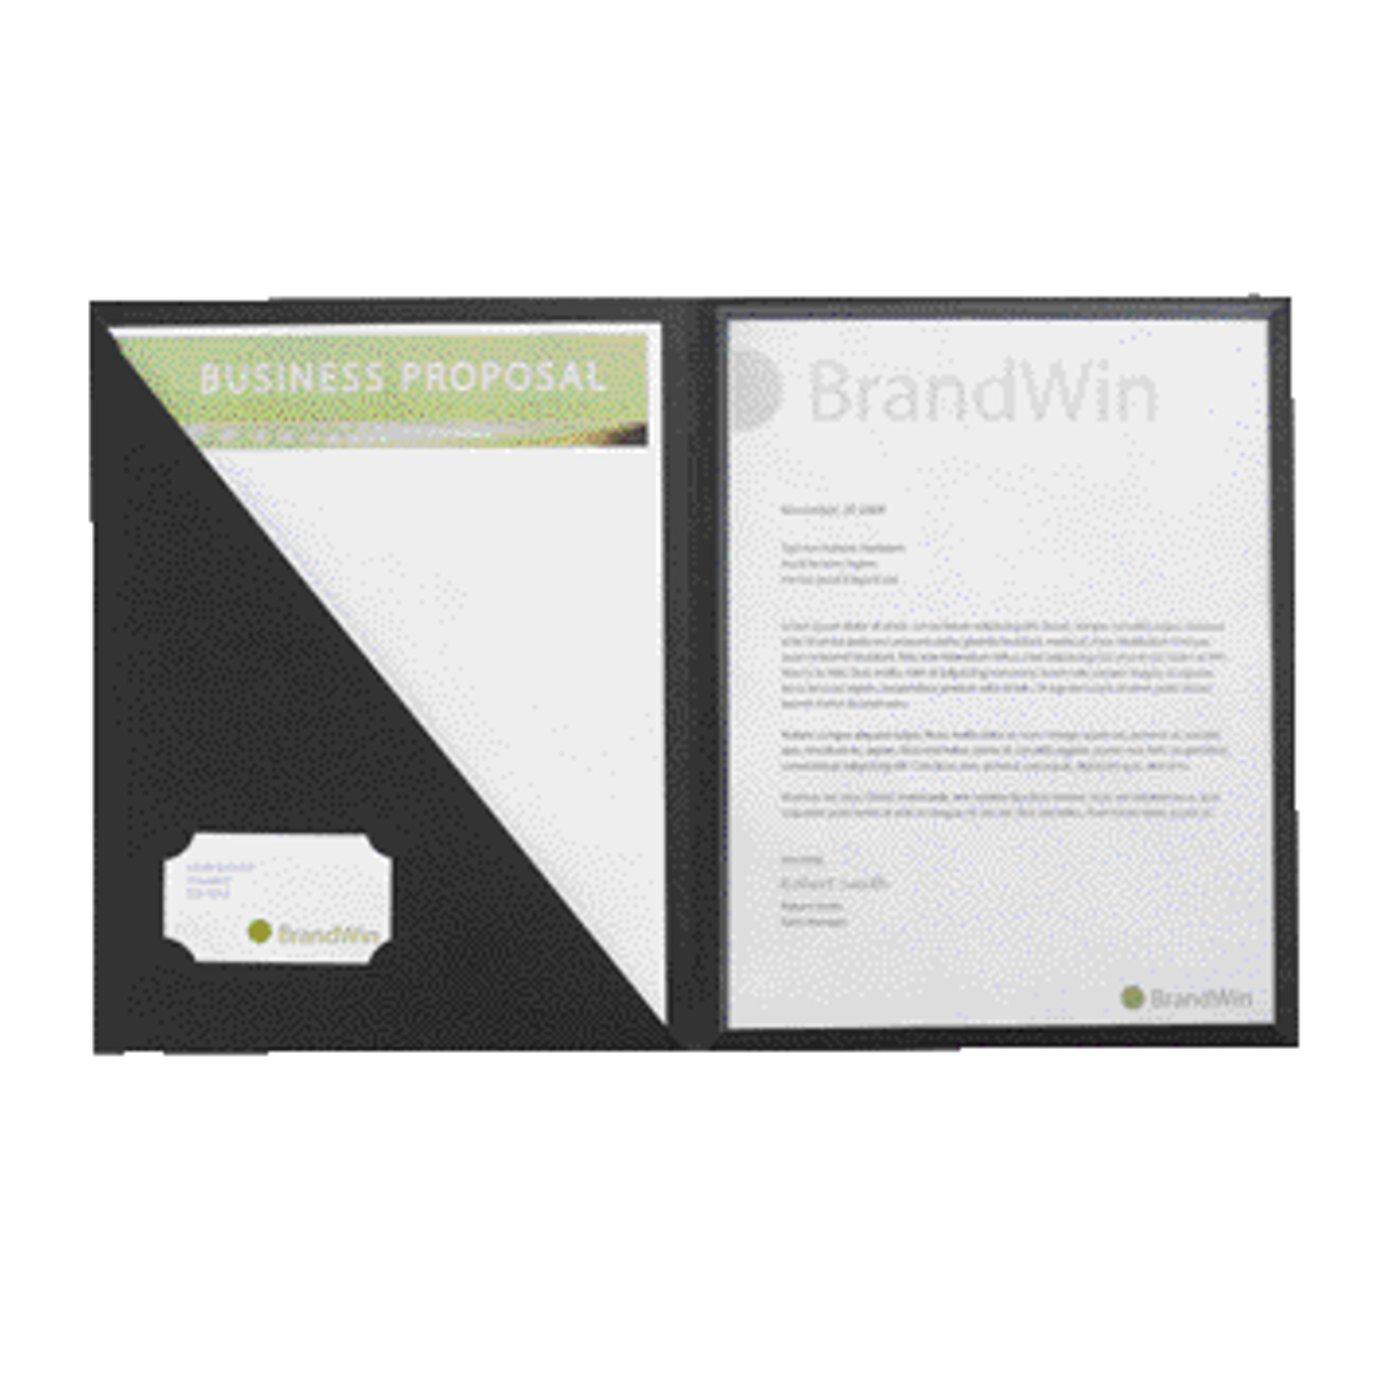 Portfolio Cover Letter: Presentation Report Covers